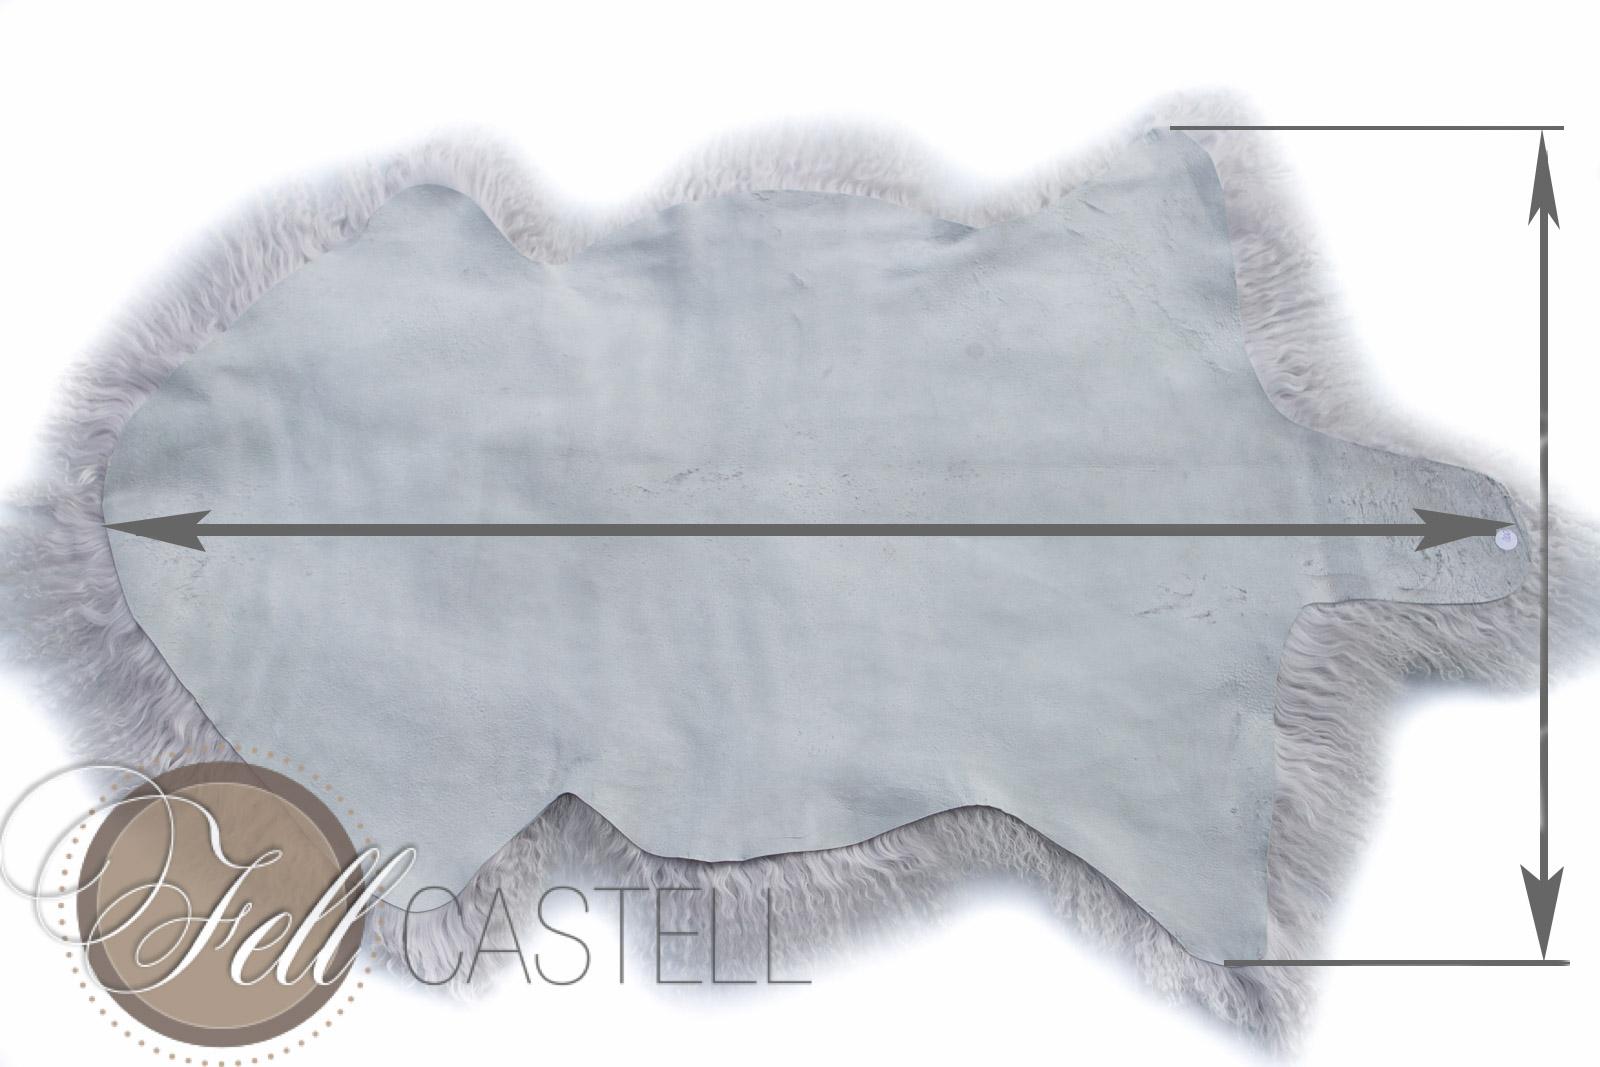 teppich tibet lammfell silbergrau decke tibetfell grau mit weissen spitzen lammfell. Black Bedroom Furniture Sets. Home Design Ideas